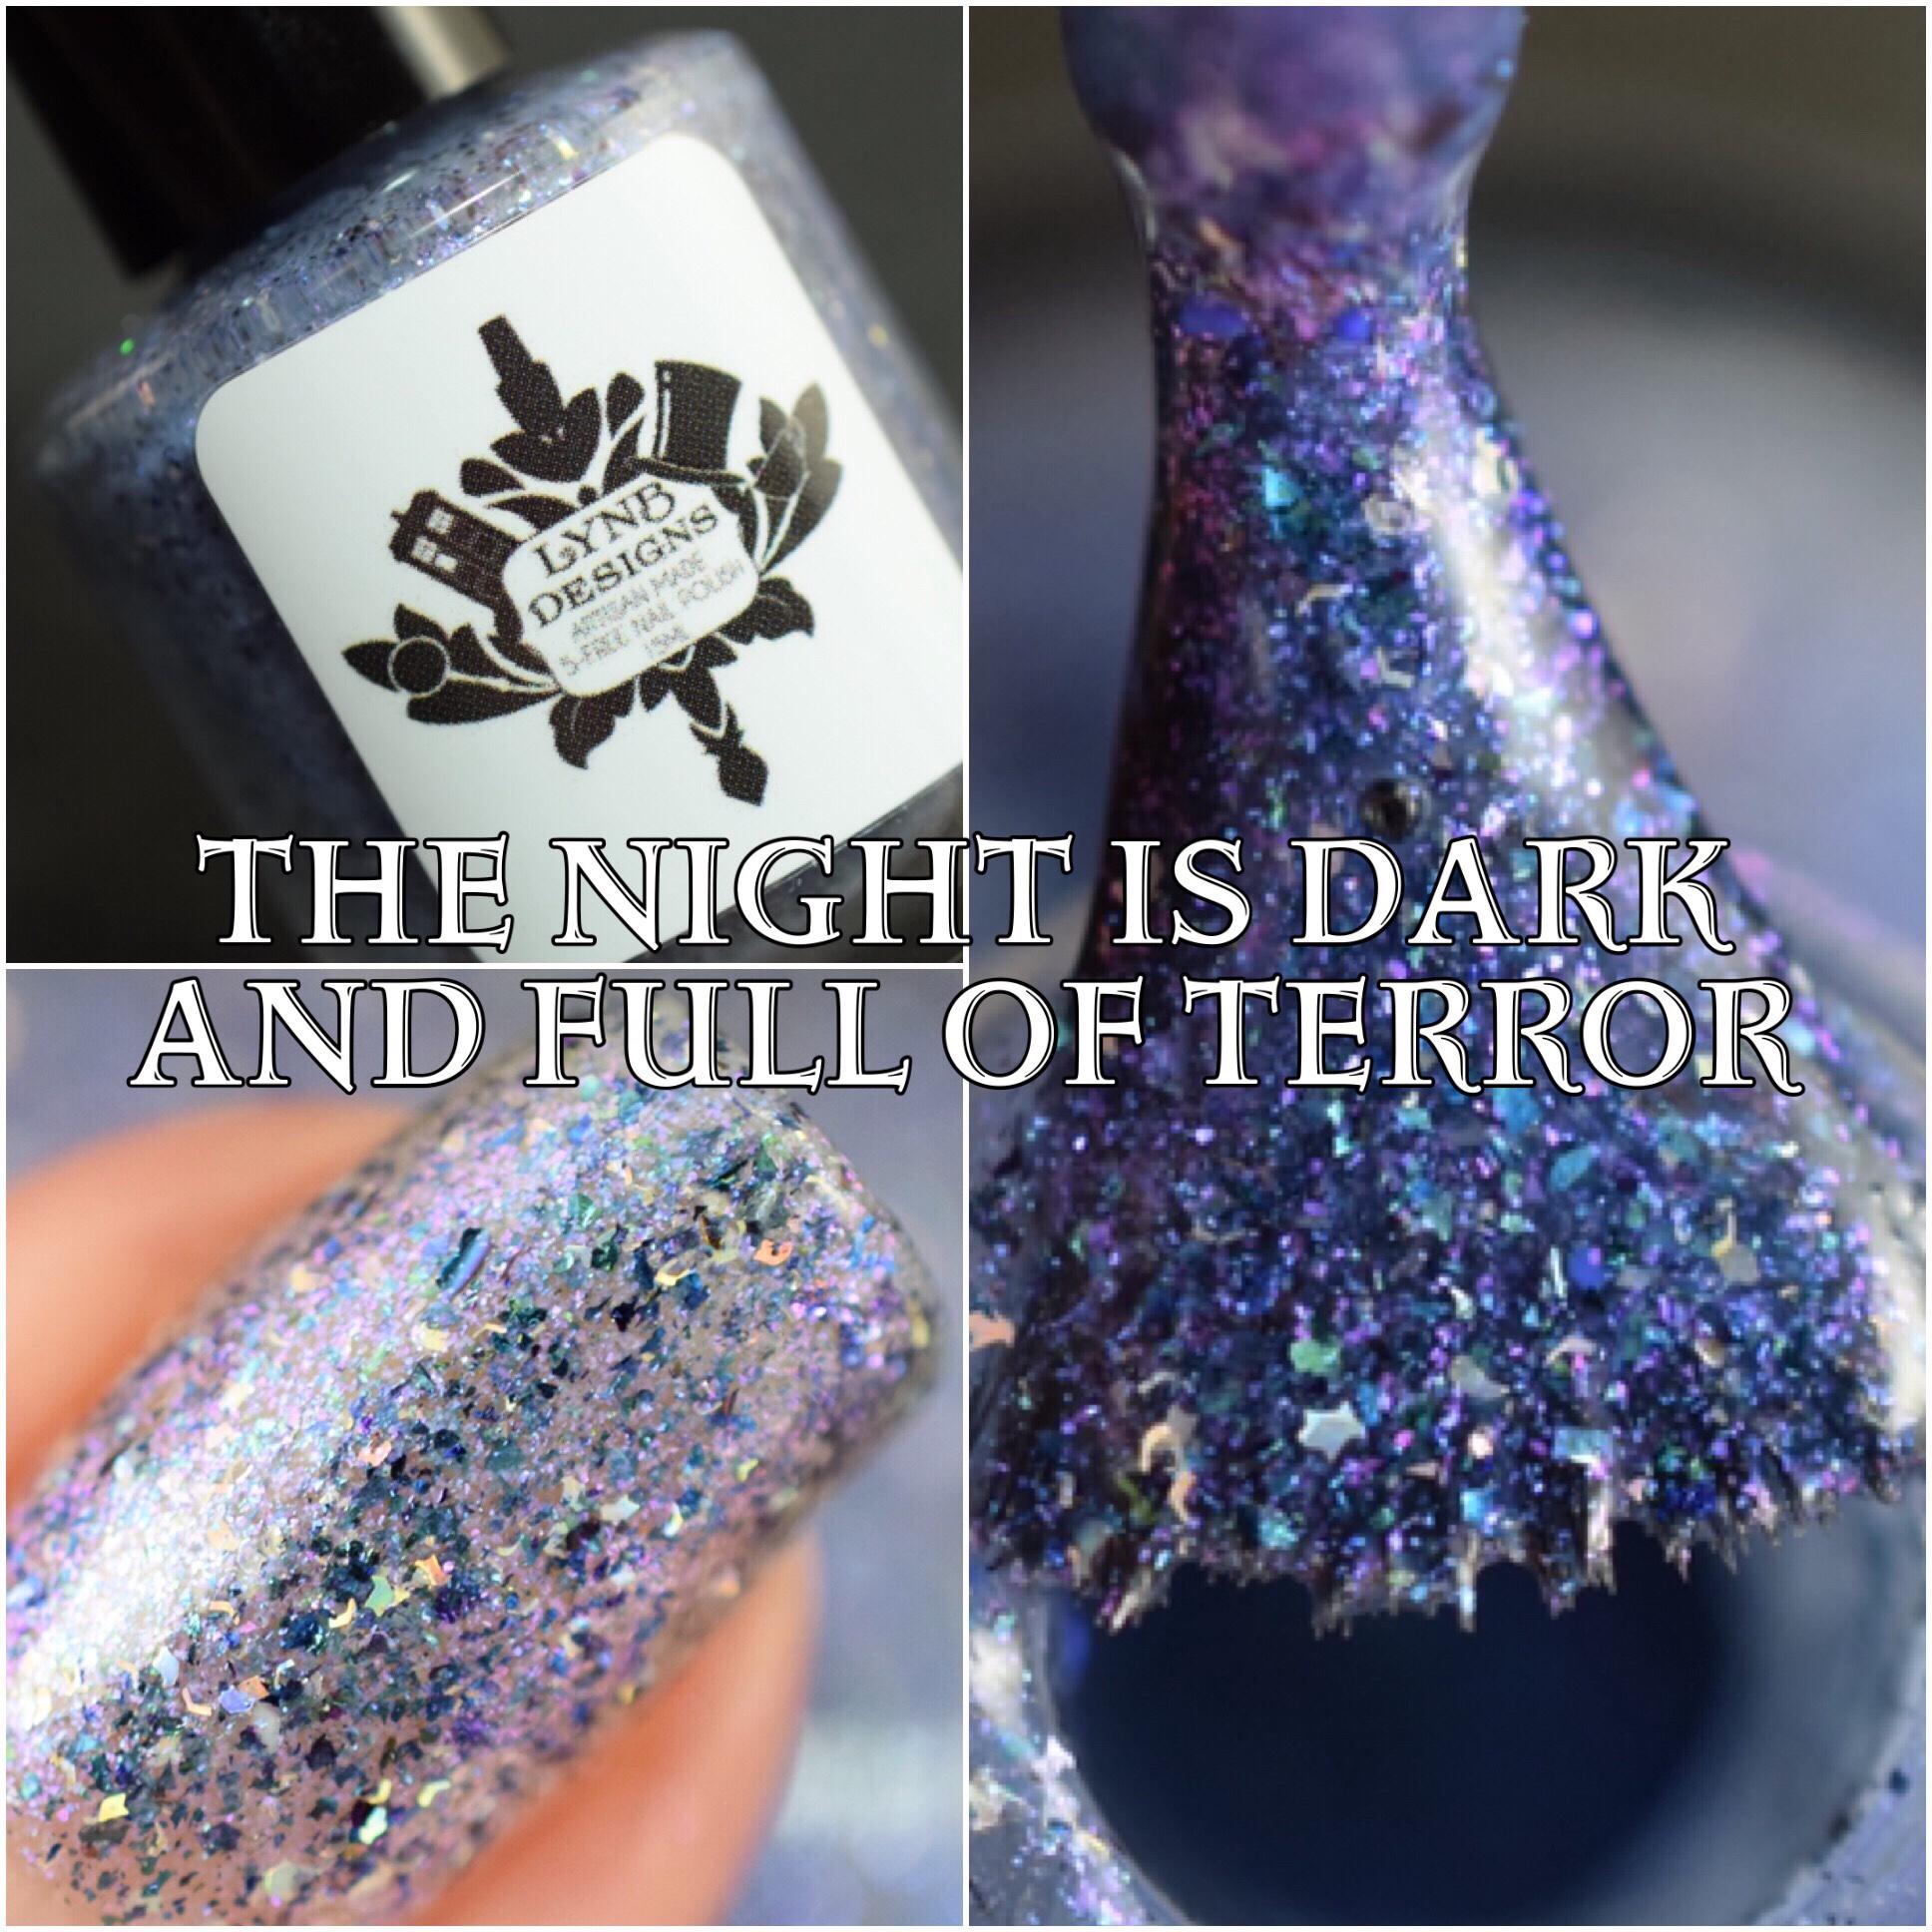 LynB Designs The Night is Dark and Full of Terror